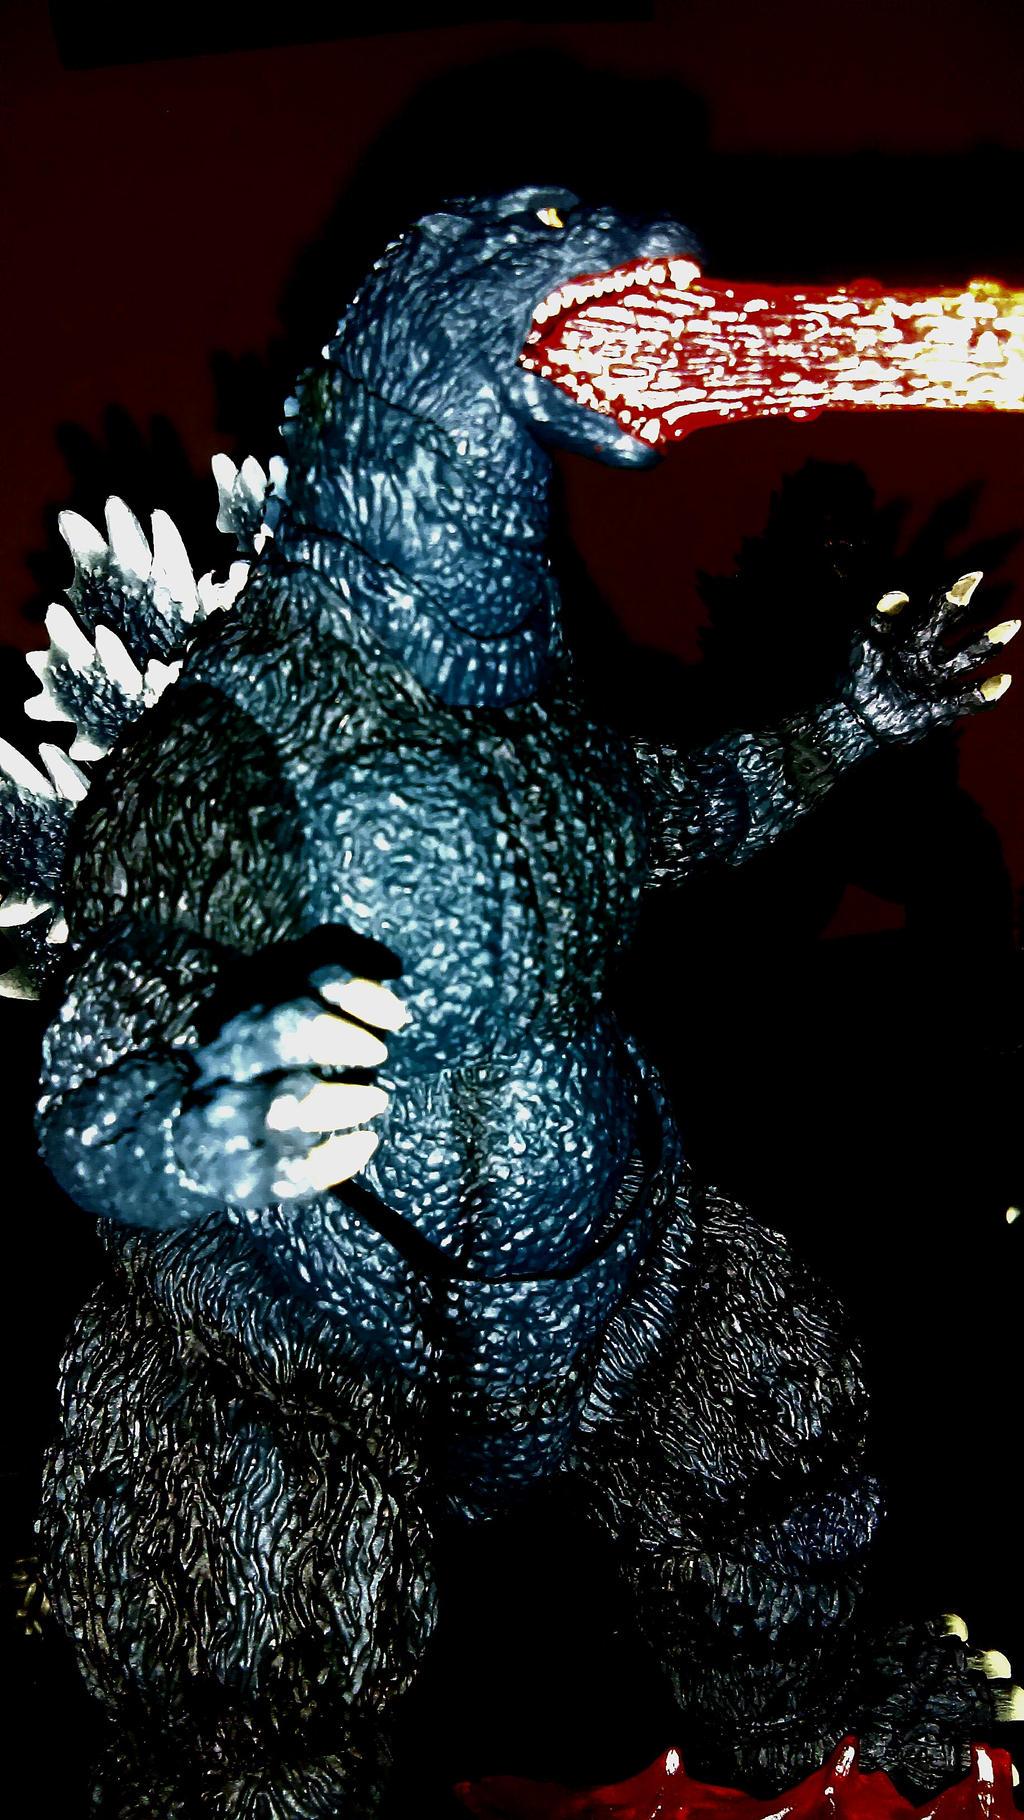 Godzilla 90's Red Atomic Breath by Kongzilla92 on DeviantArt